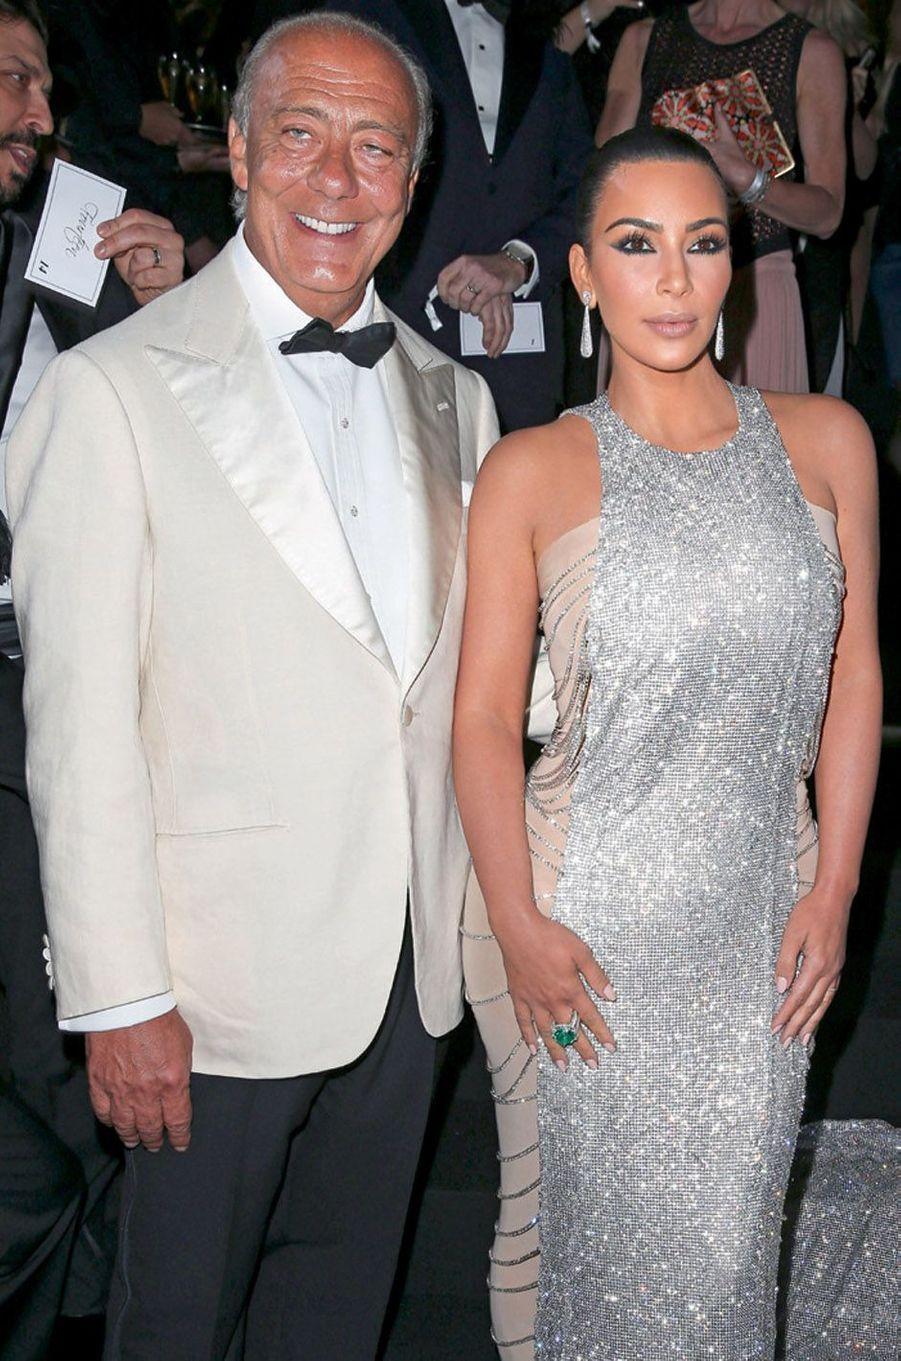 Fawaz Gruosi, Kim Kardashian.